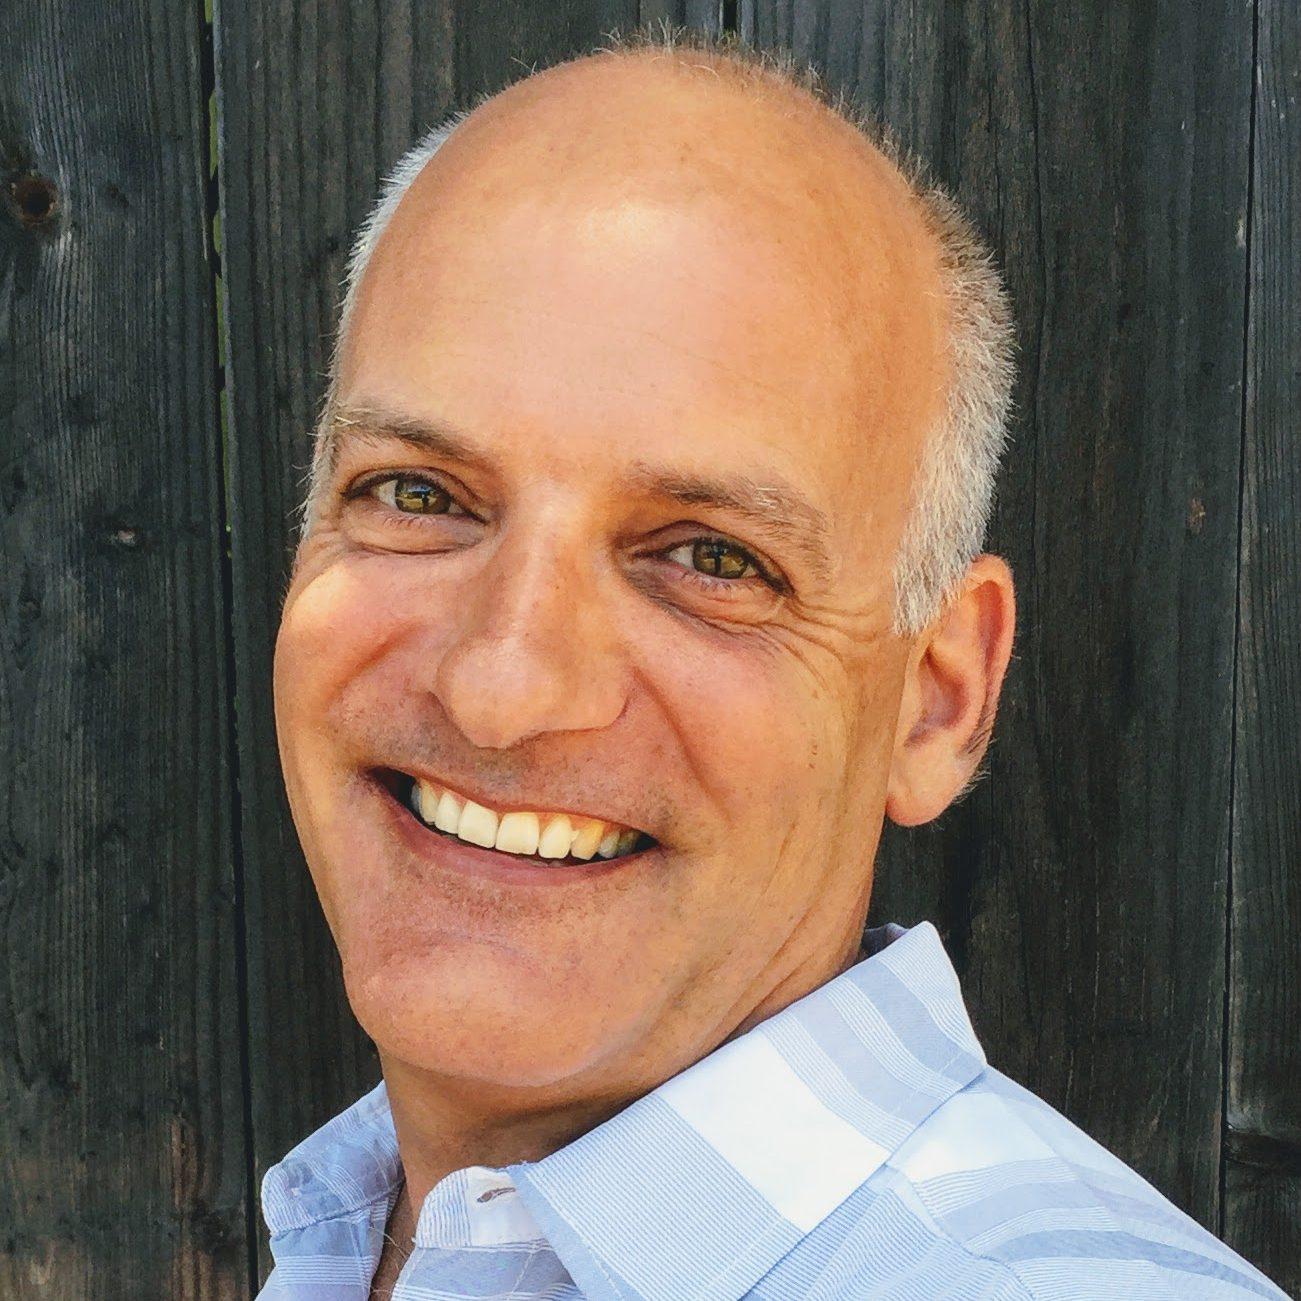 Dan Tousignant - Project Management Influencers